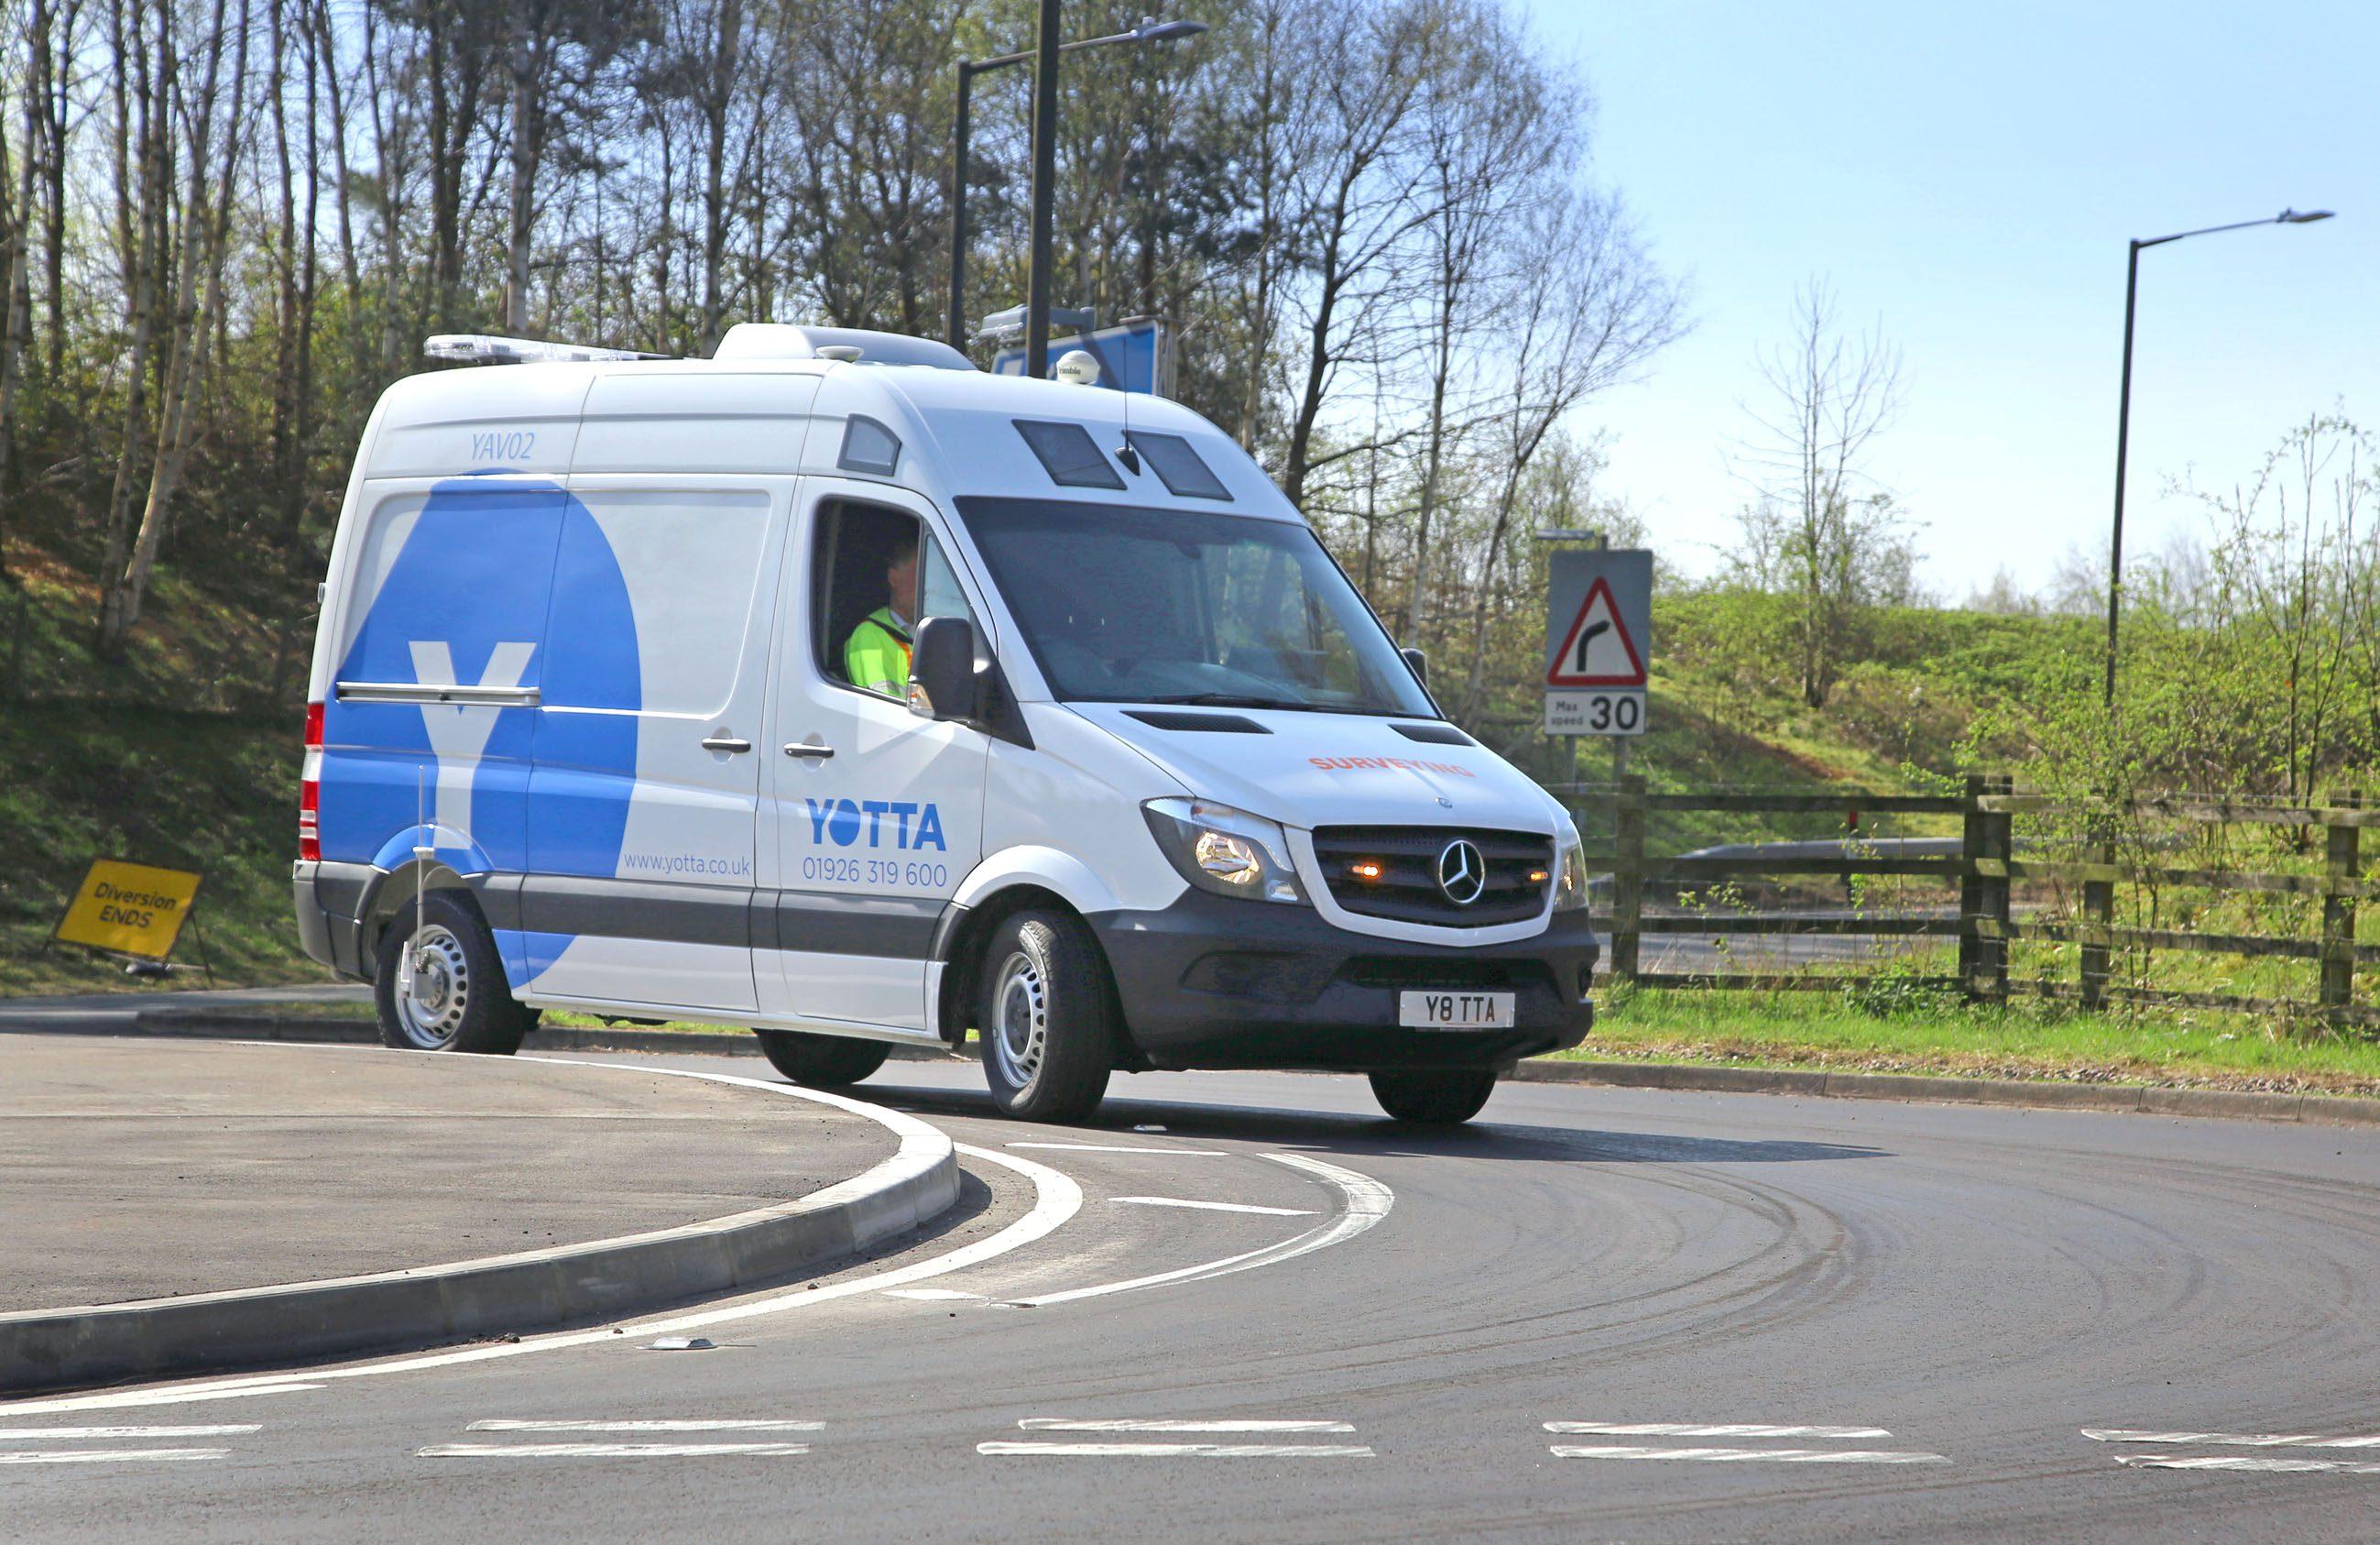 Yotta Launches its Latest Video Survey Vehicle